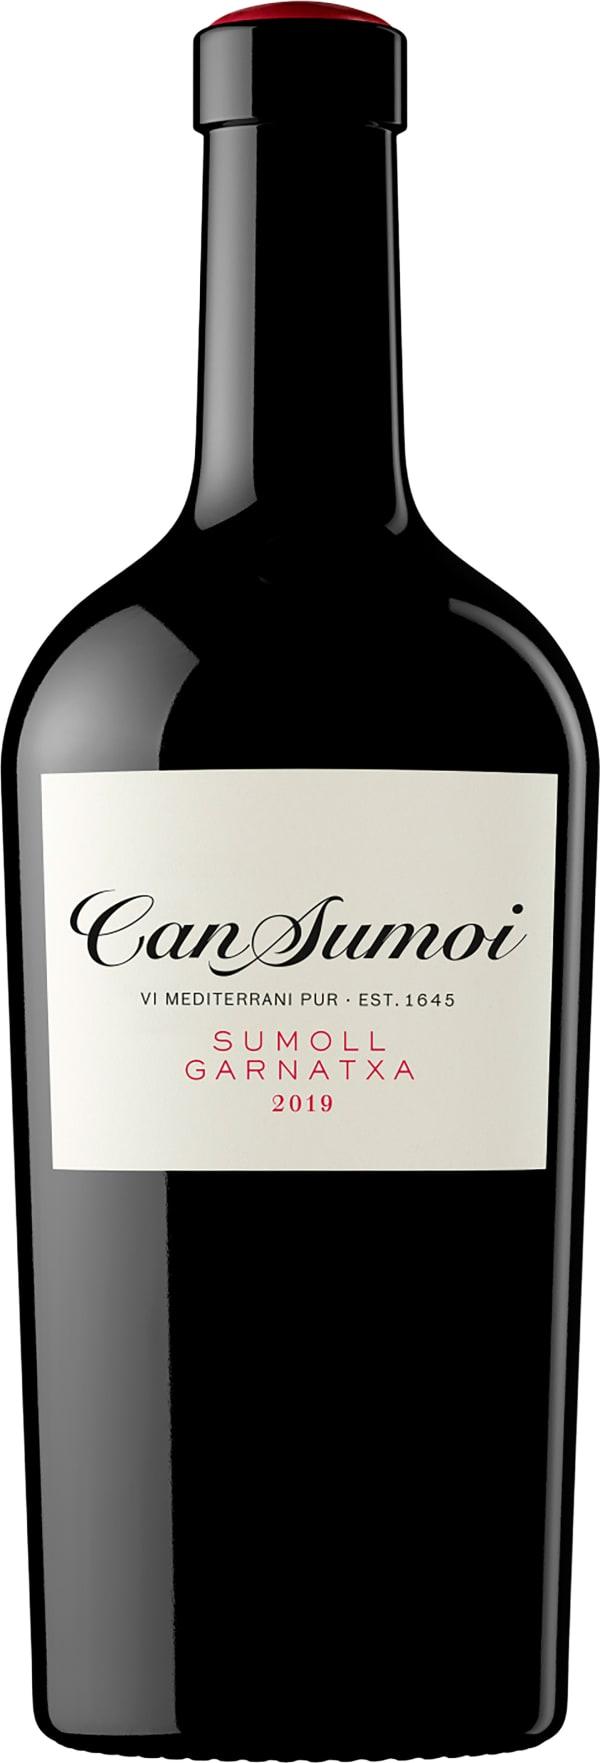 Can Sumoi Sumoll Garnatxa 2019